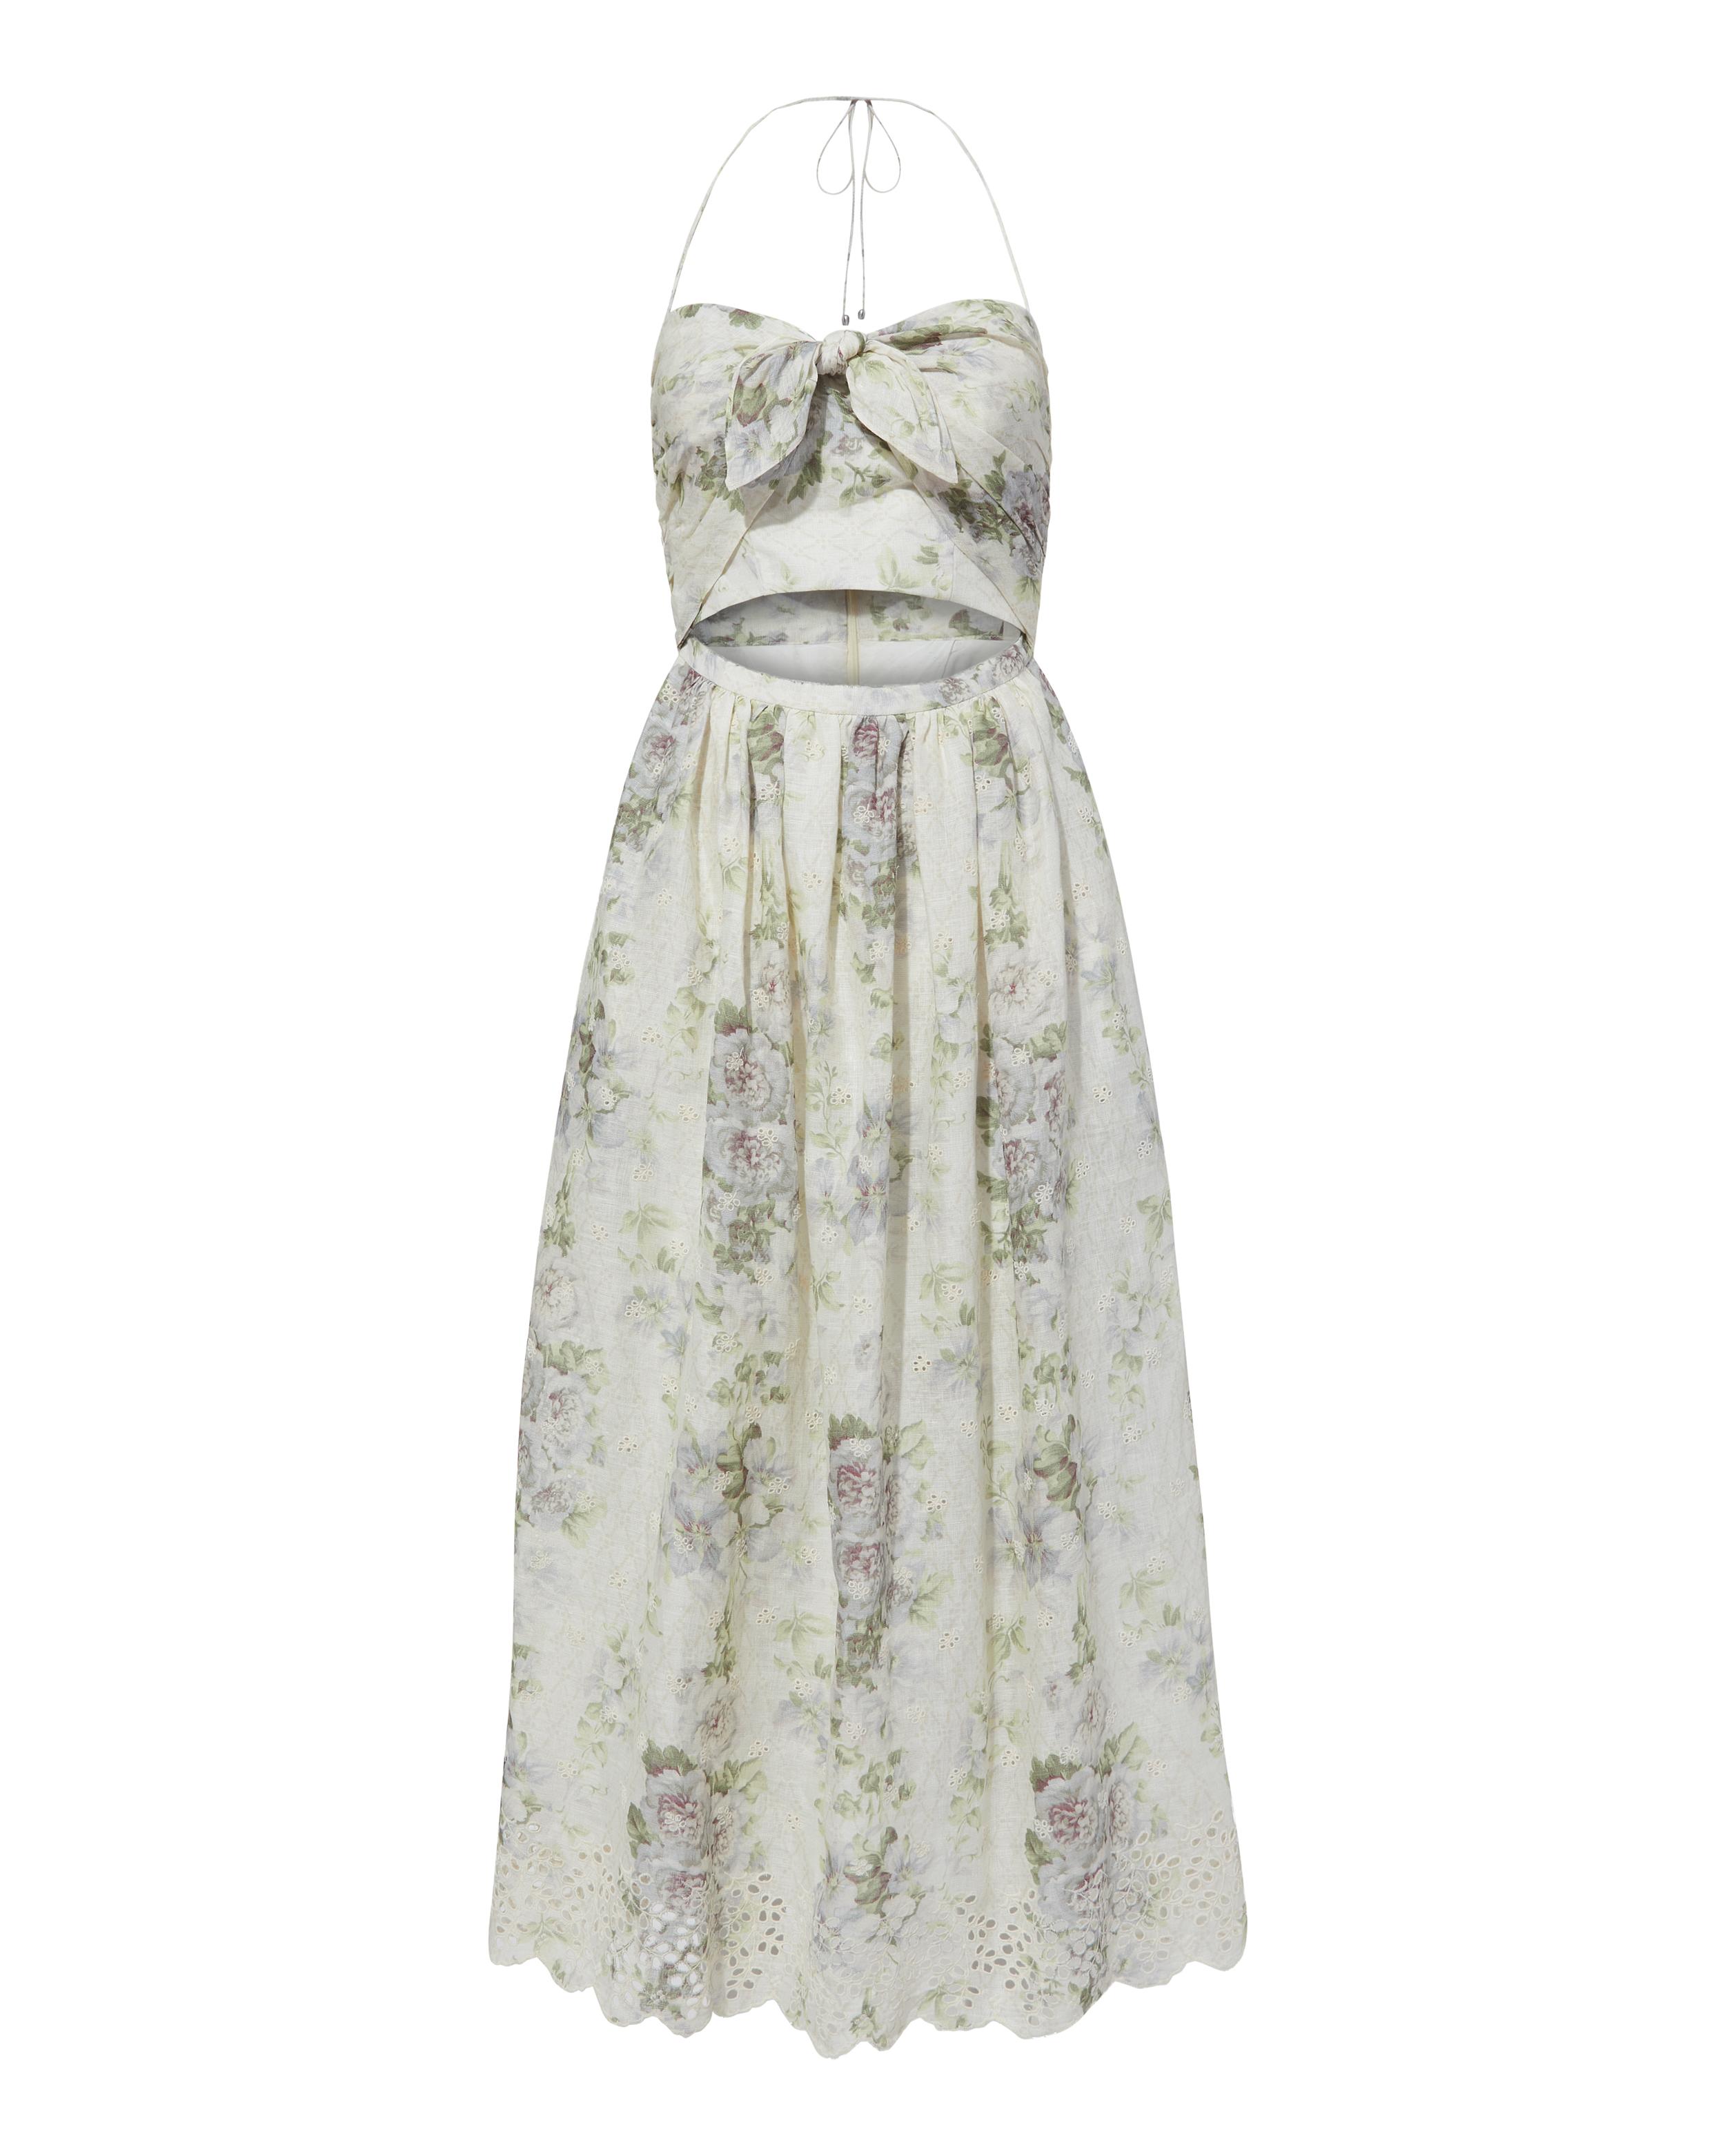 Iris Picnic Dress by Zimmermann